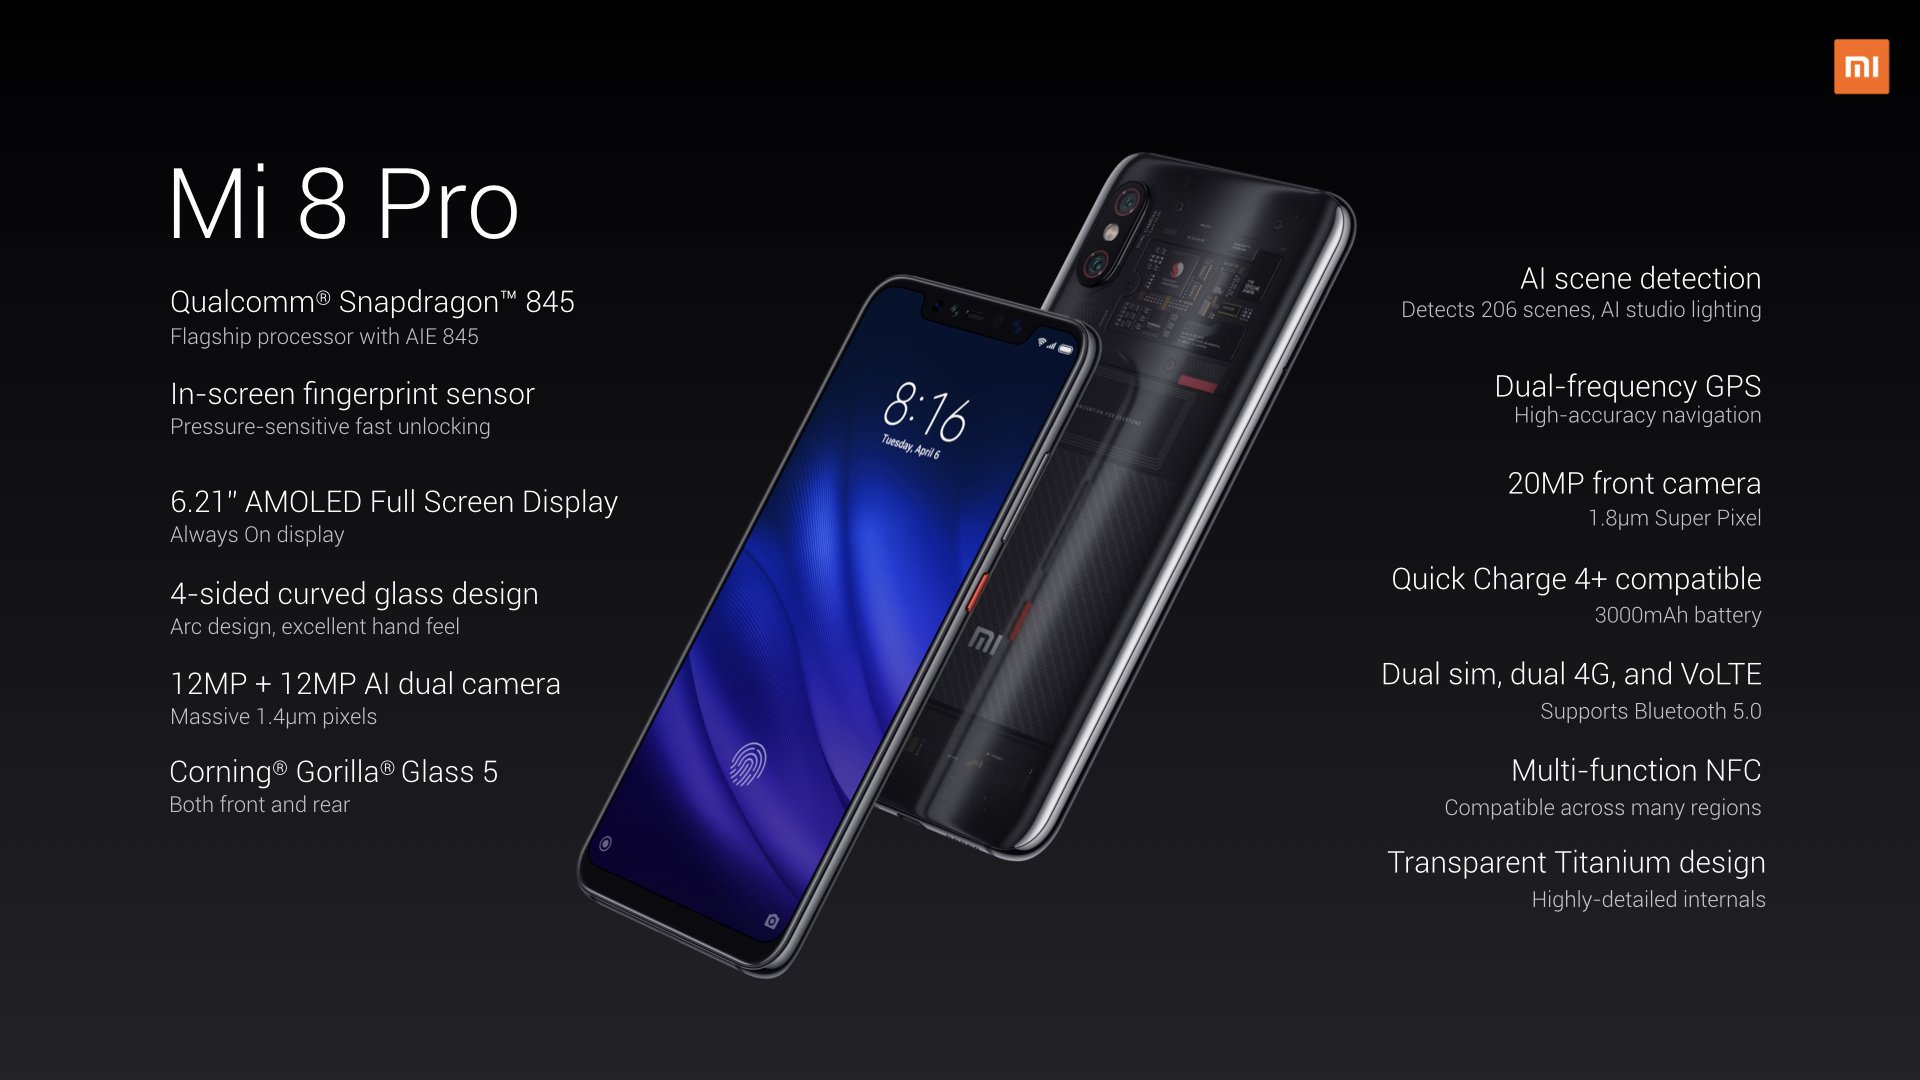 Xiaomi تعلن عن اجهزة جديدة في مختلف الفئات 2